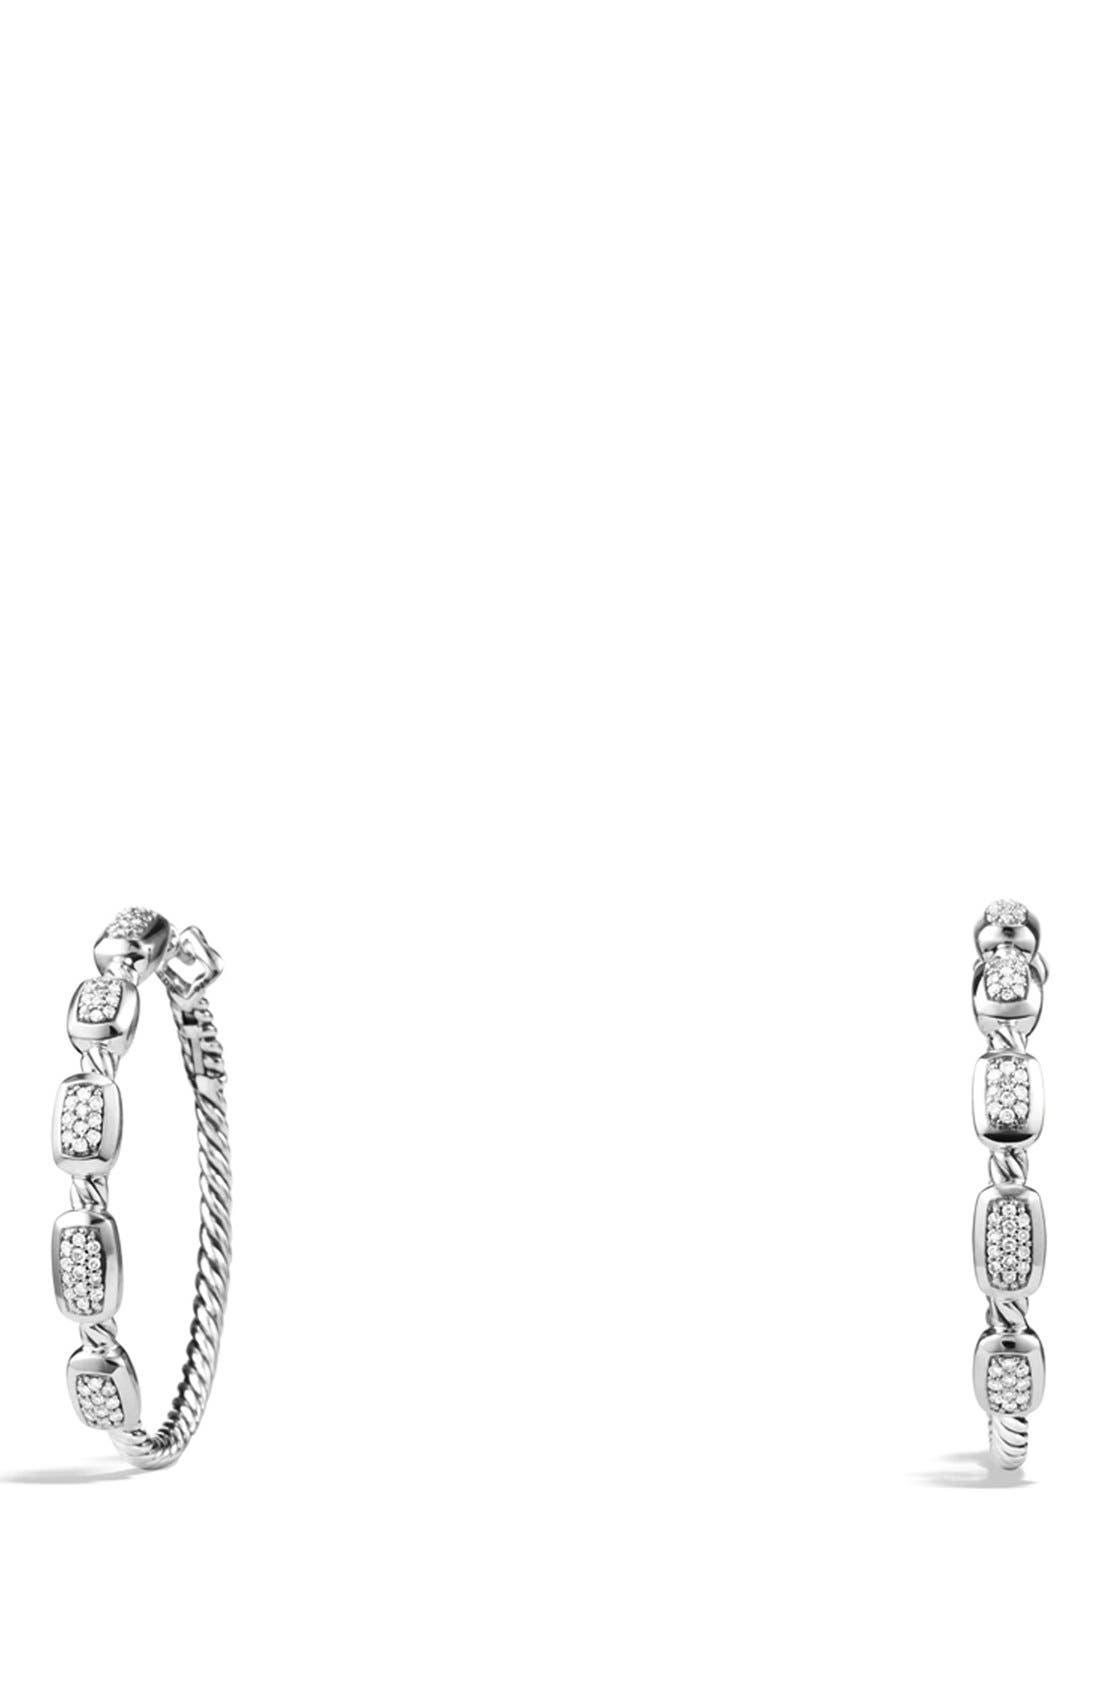 David Yurman 'Confetti' Hoop Earrings with Diamonds